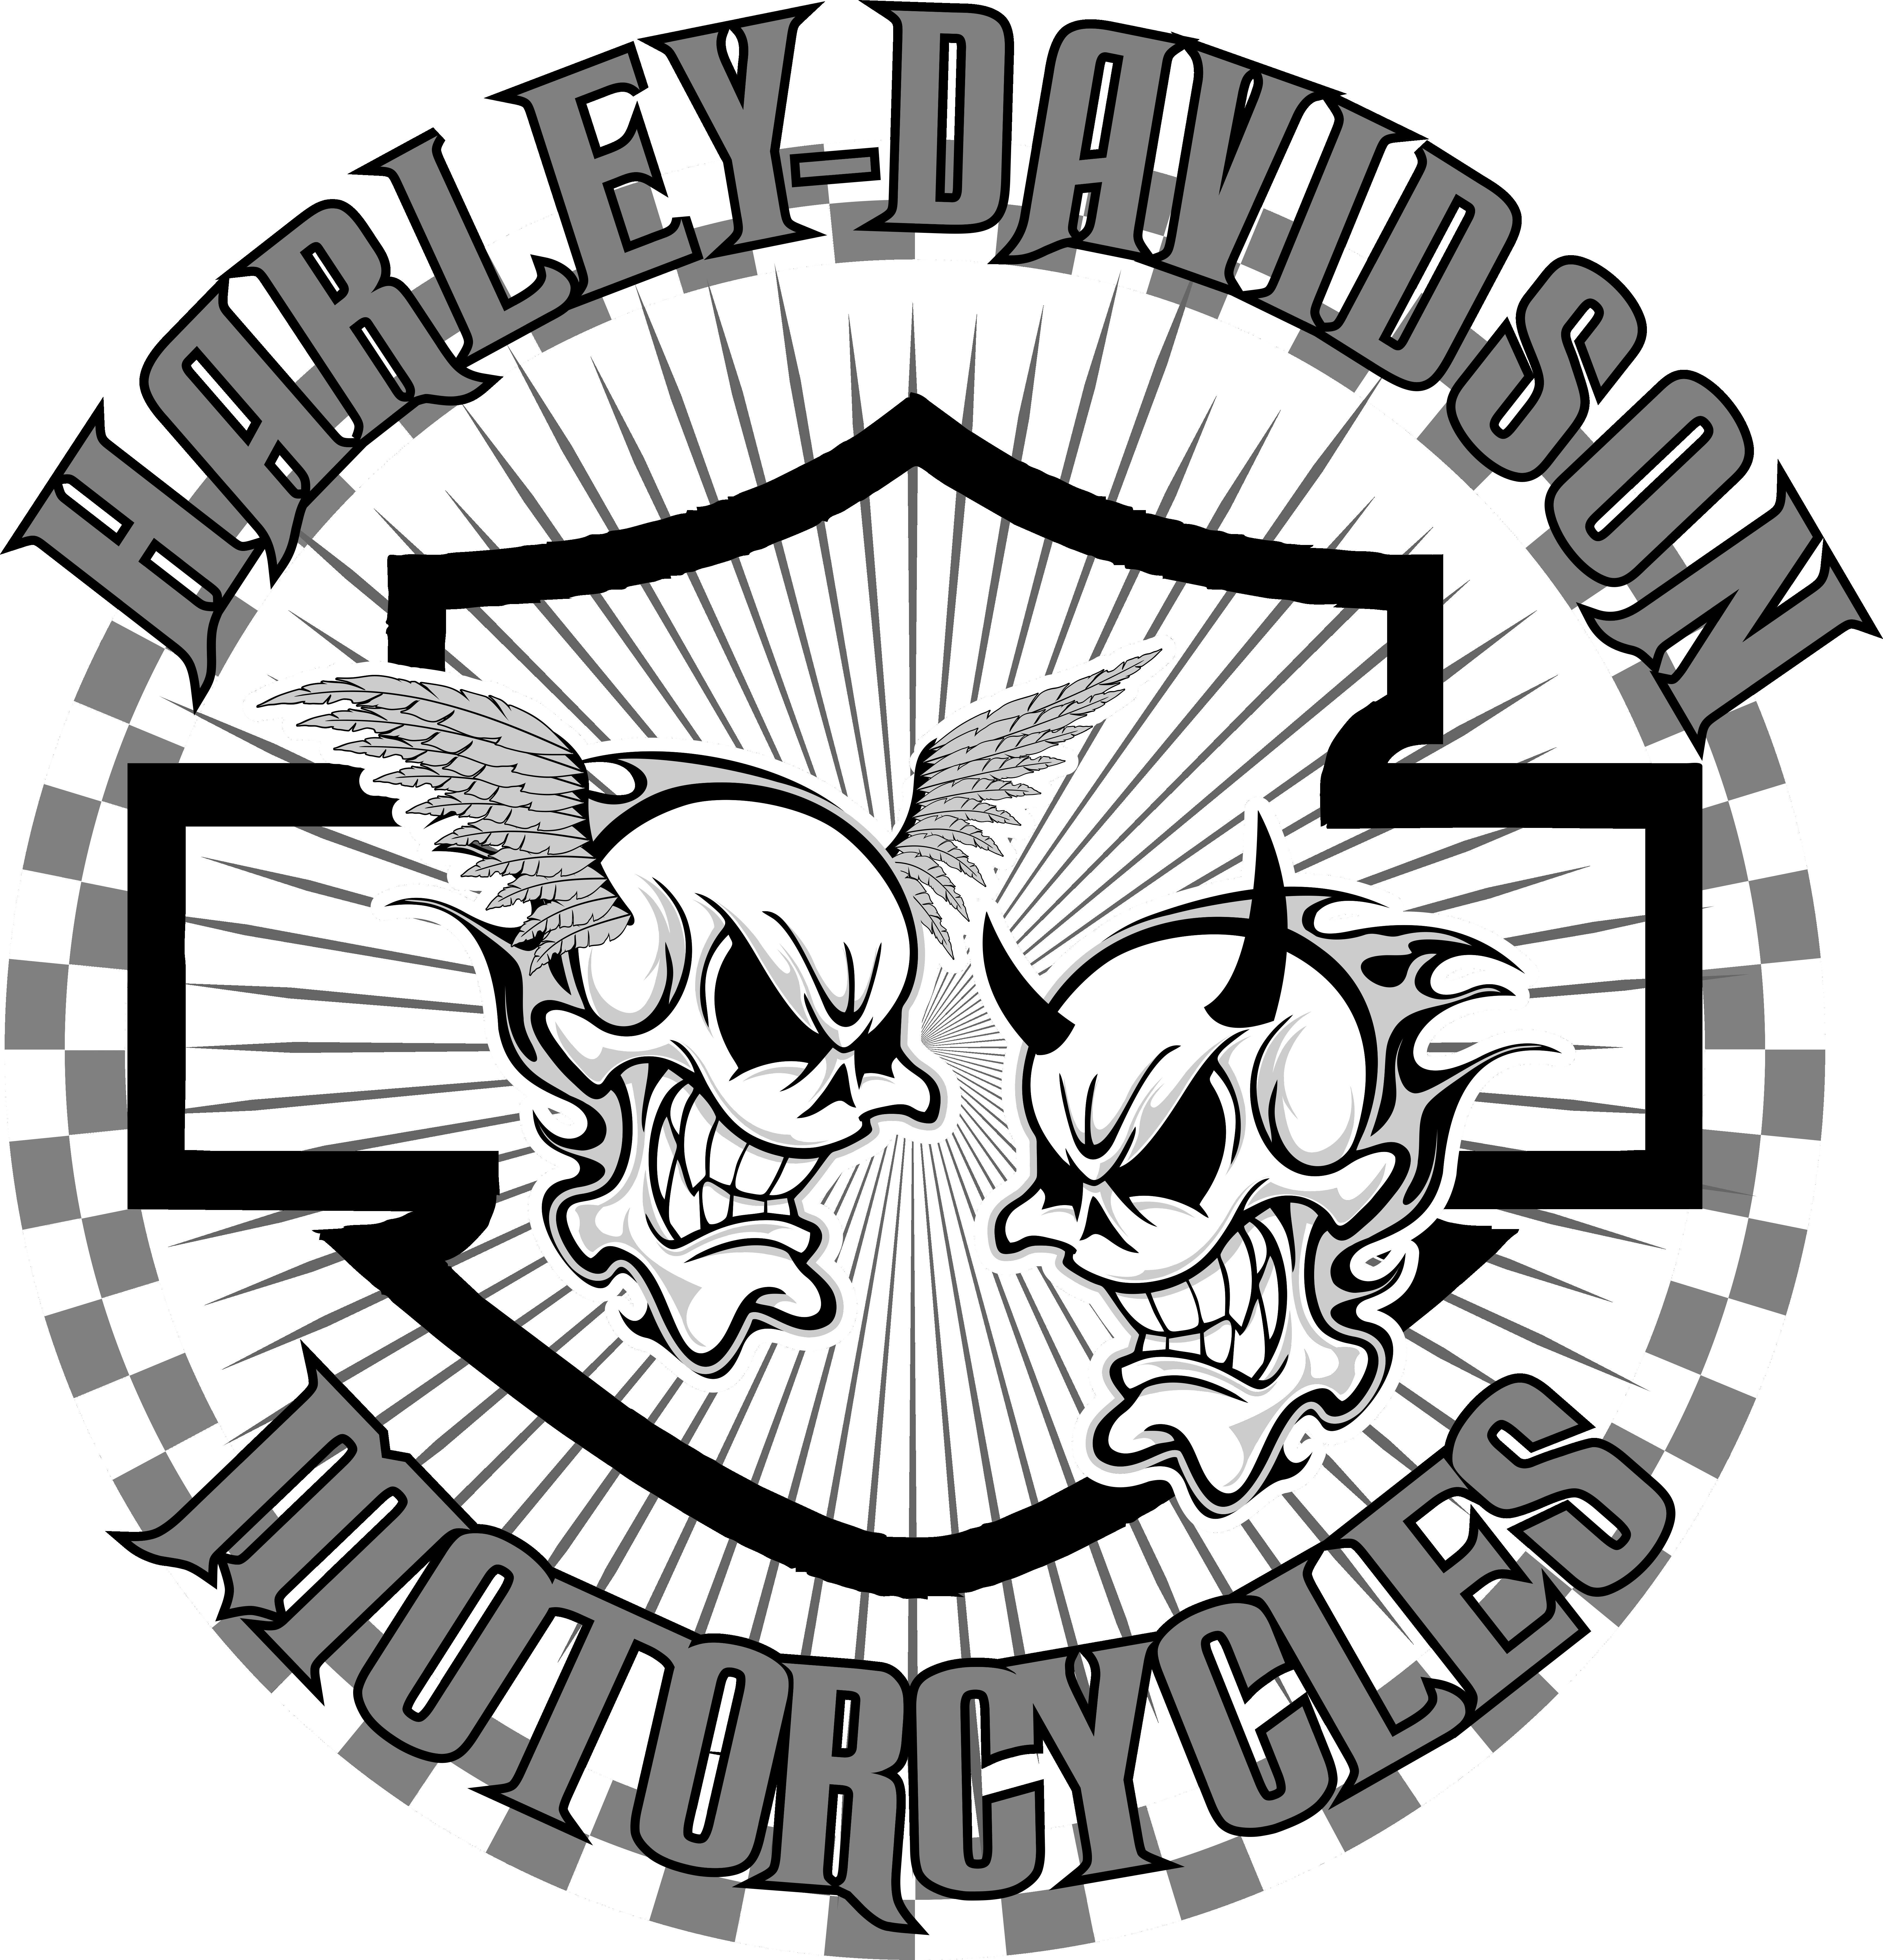 jpg freeuse stock Pin by kane cordova. Harley davidson clipart project.